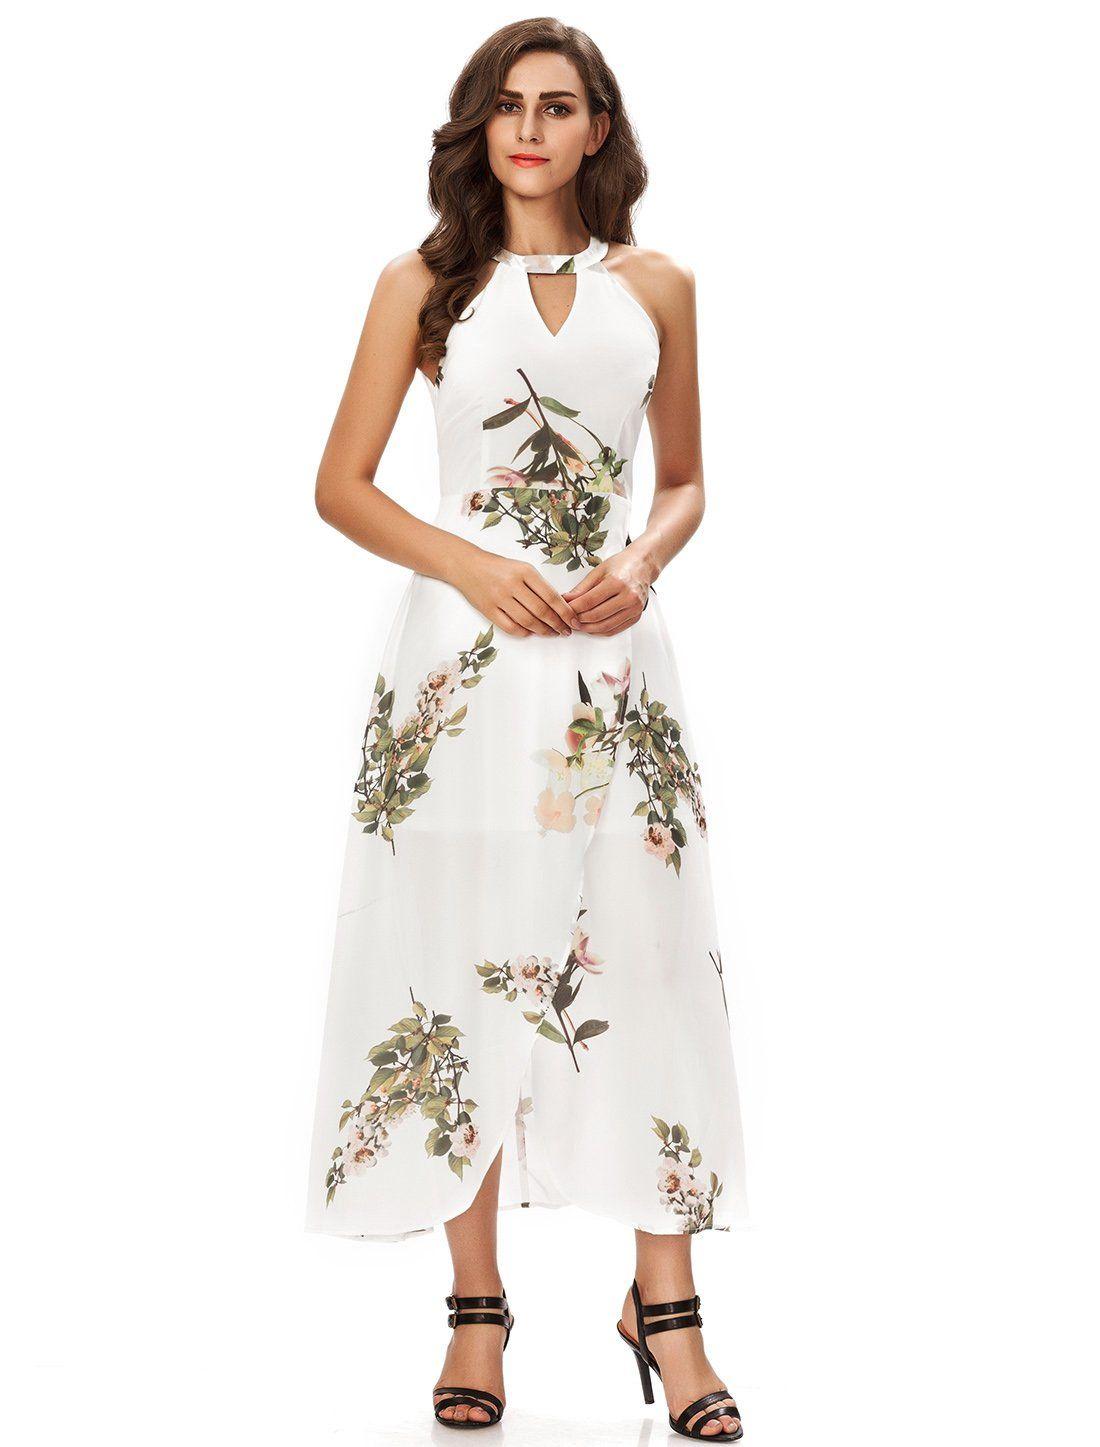 Noctflos Womens Halterneck Floral Slit Maxi Cocktail Wedding Party